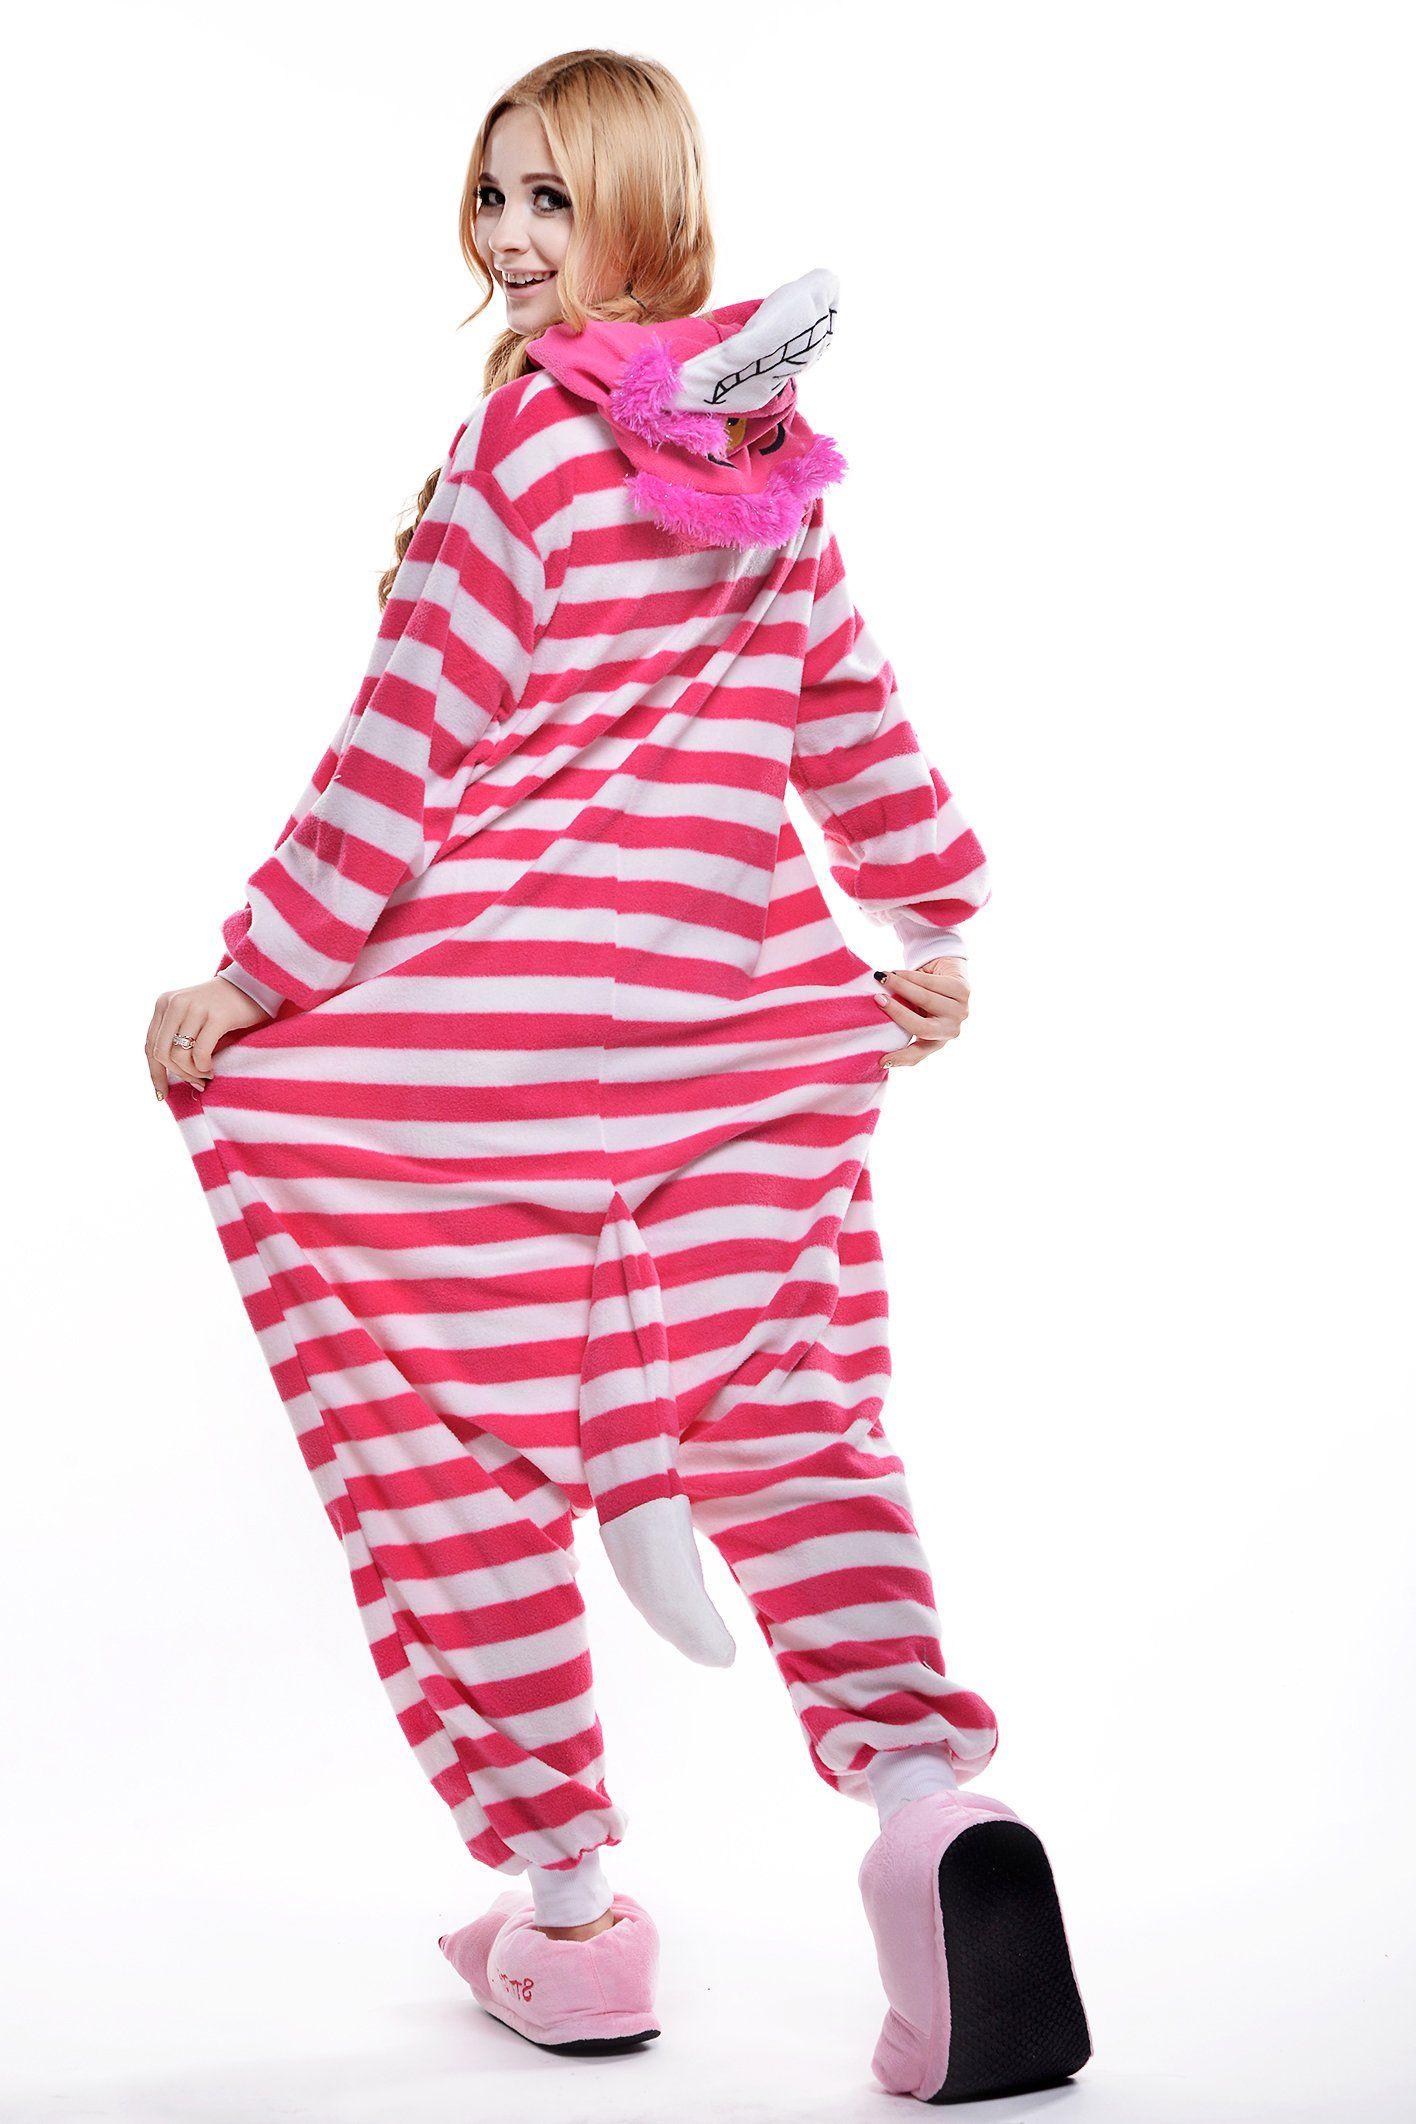 a02a5d23a Amazon.com: Newcosplay Unisex Cheshire Cat Pyjamas Kigurumi Onesie Costume:  Clothing